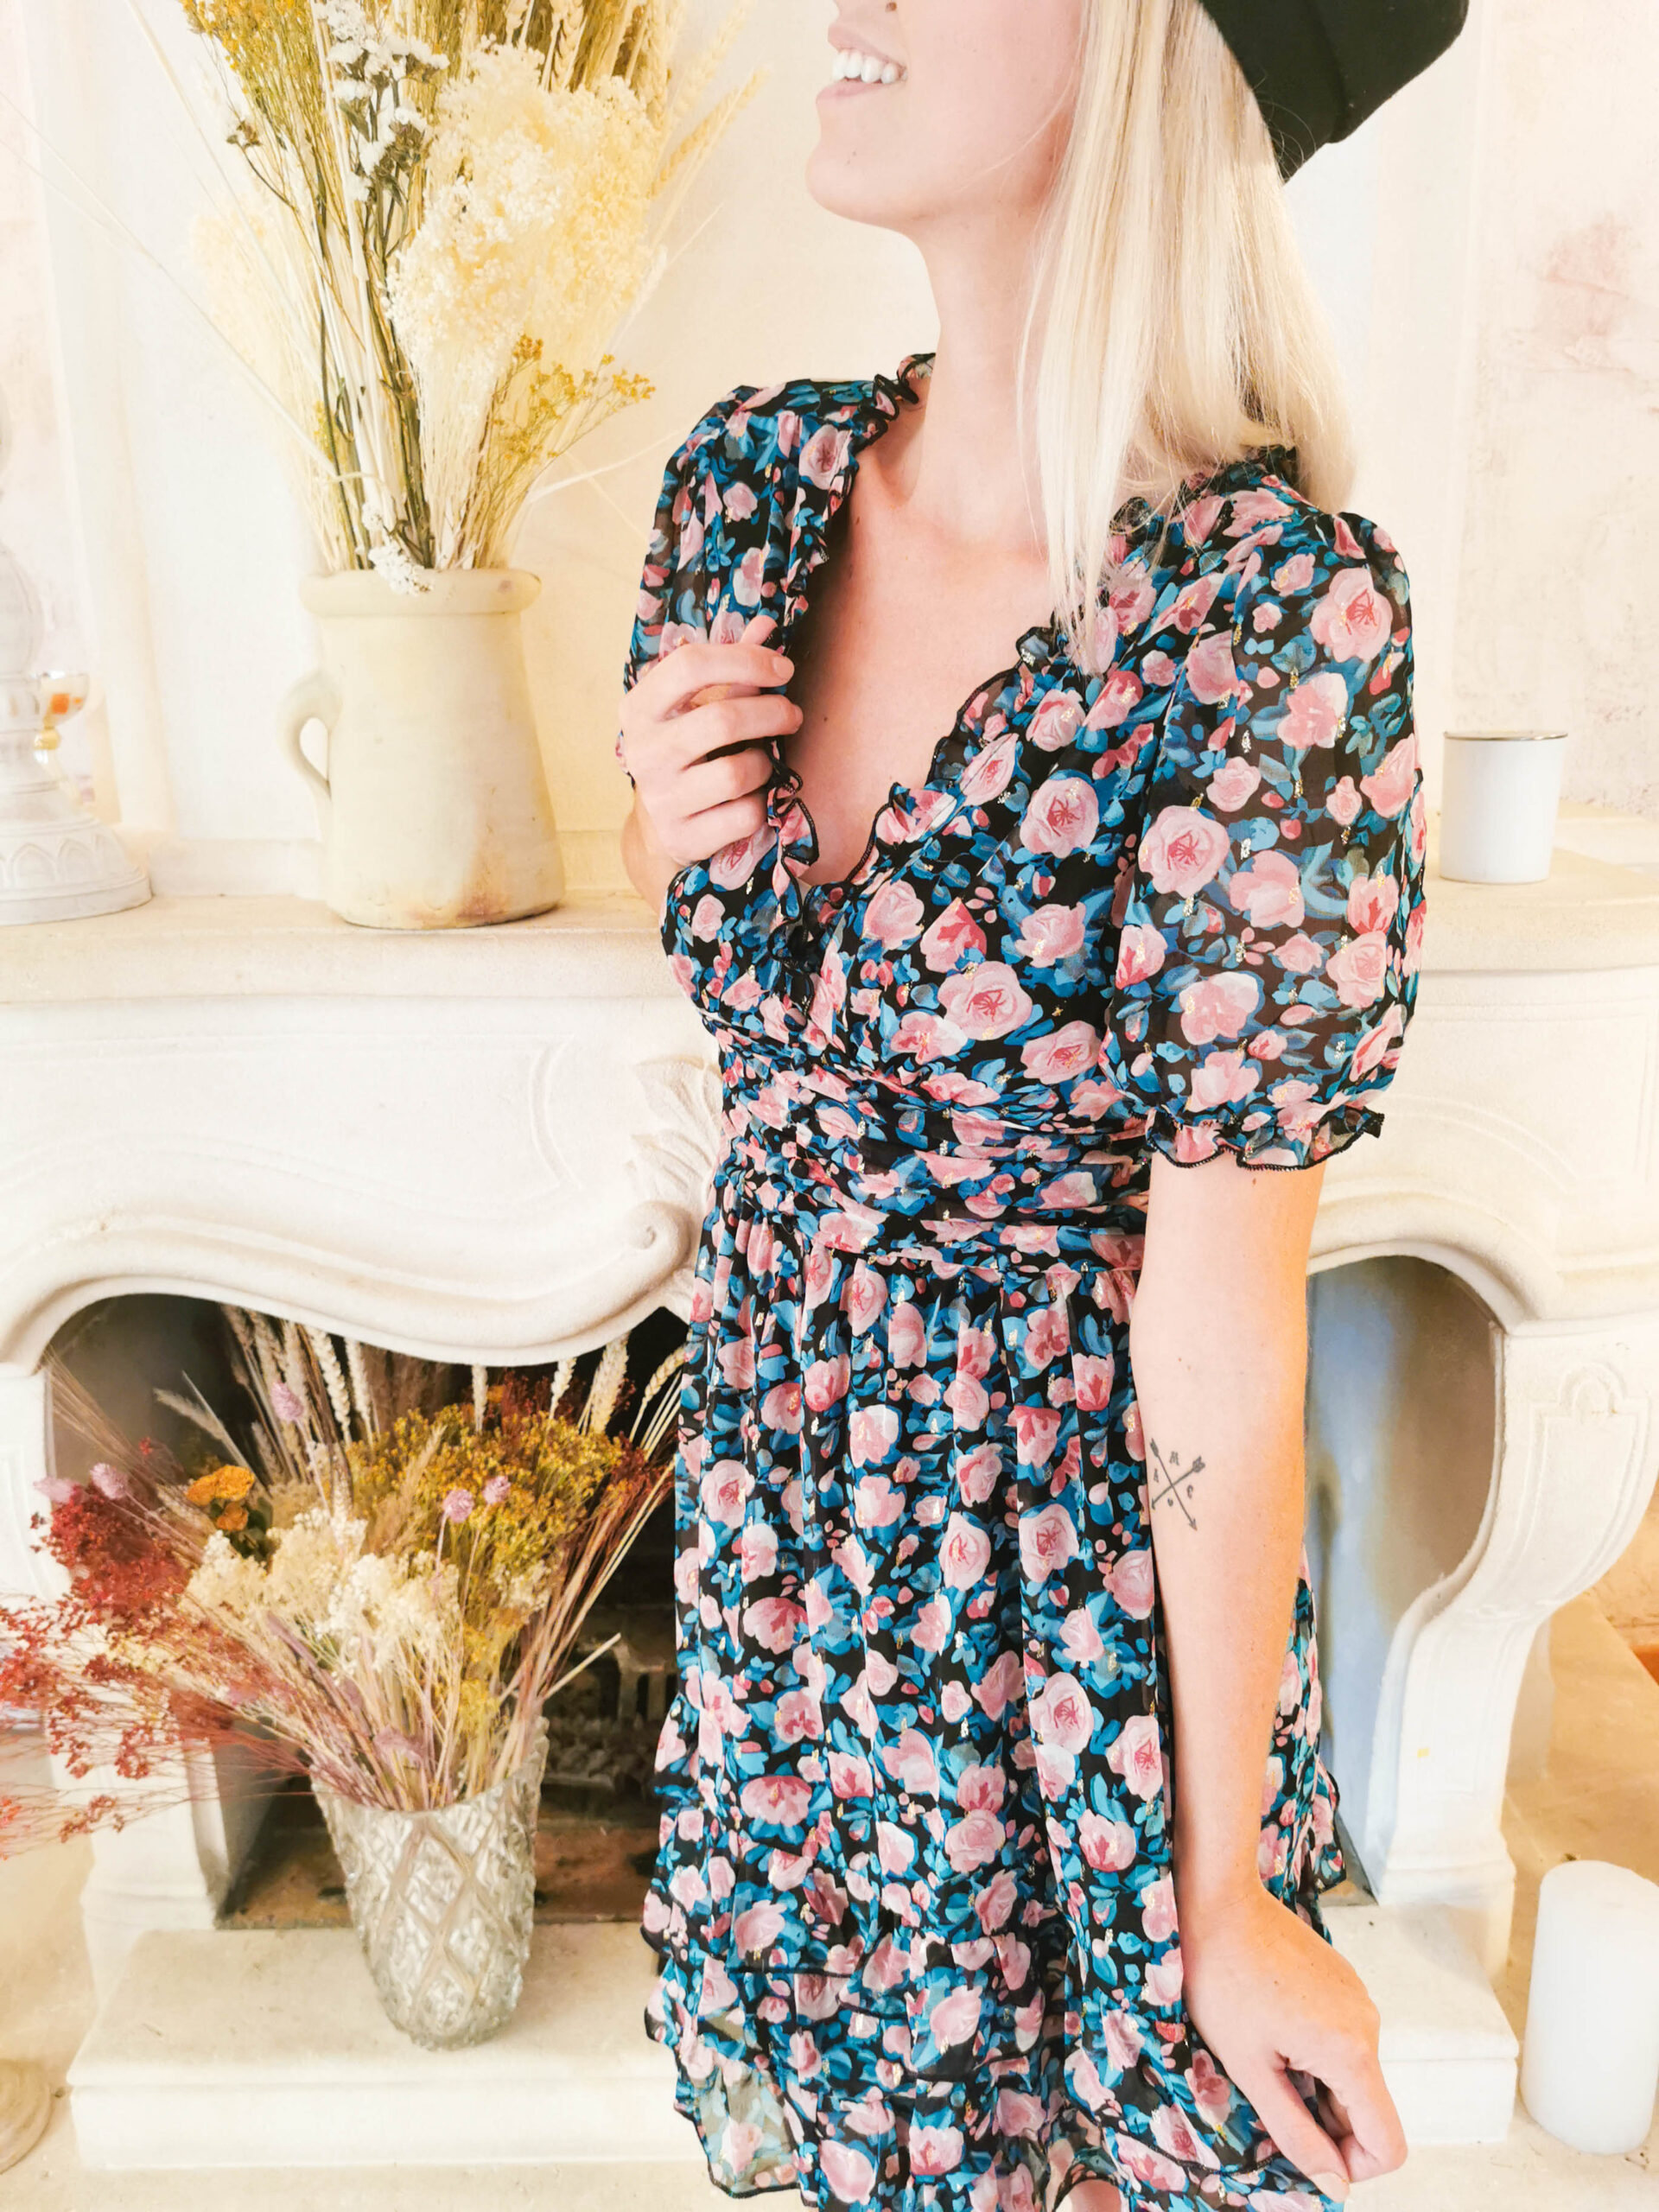 Robe courte fleurie bleue et rose